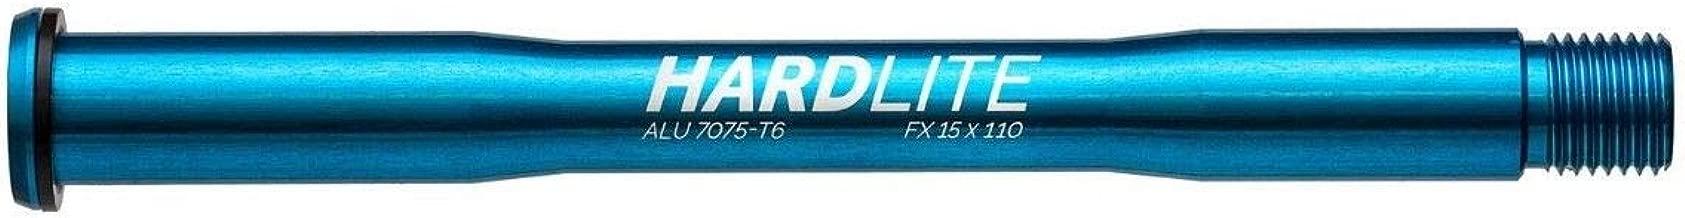 HardLite Front Thru axle - Fox Boost stepcast 15mm x 110mm